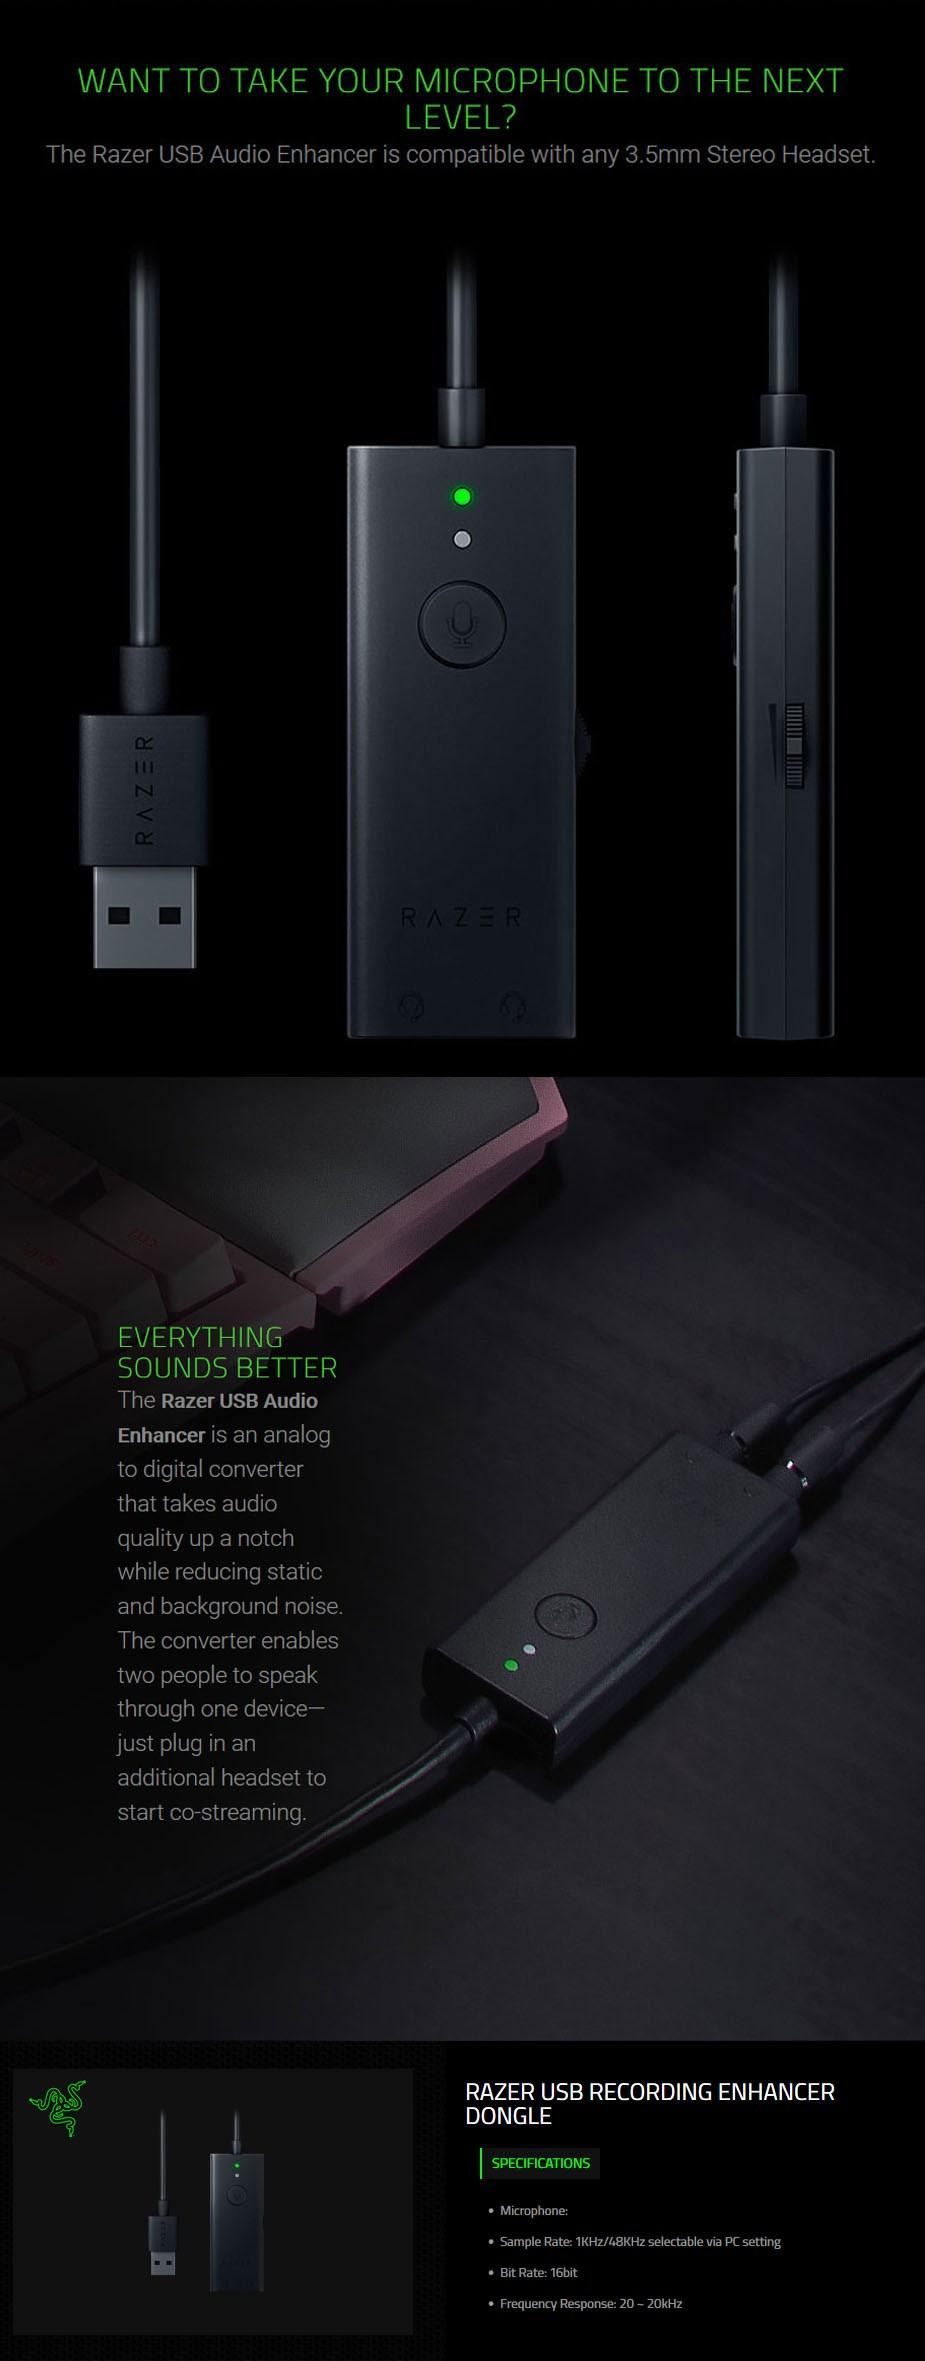 Razer USB Recording Enhancer Dongle - Desktop Overview 1